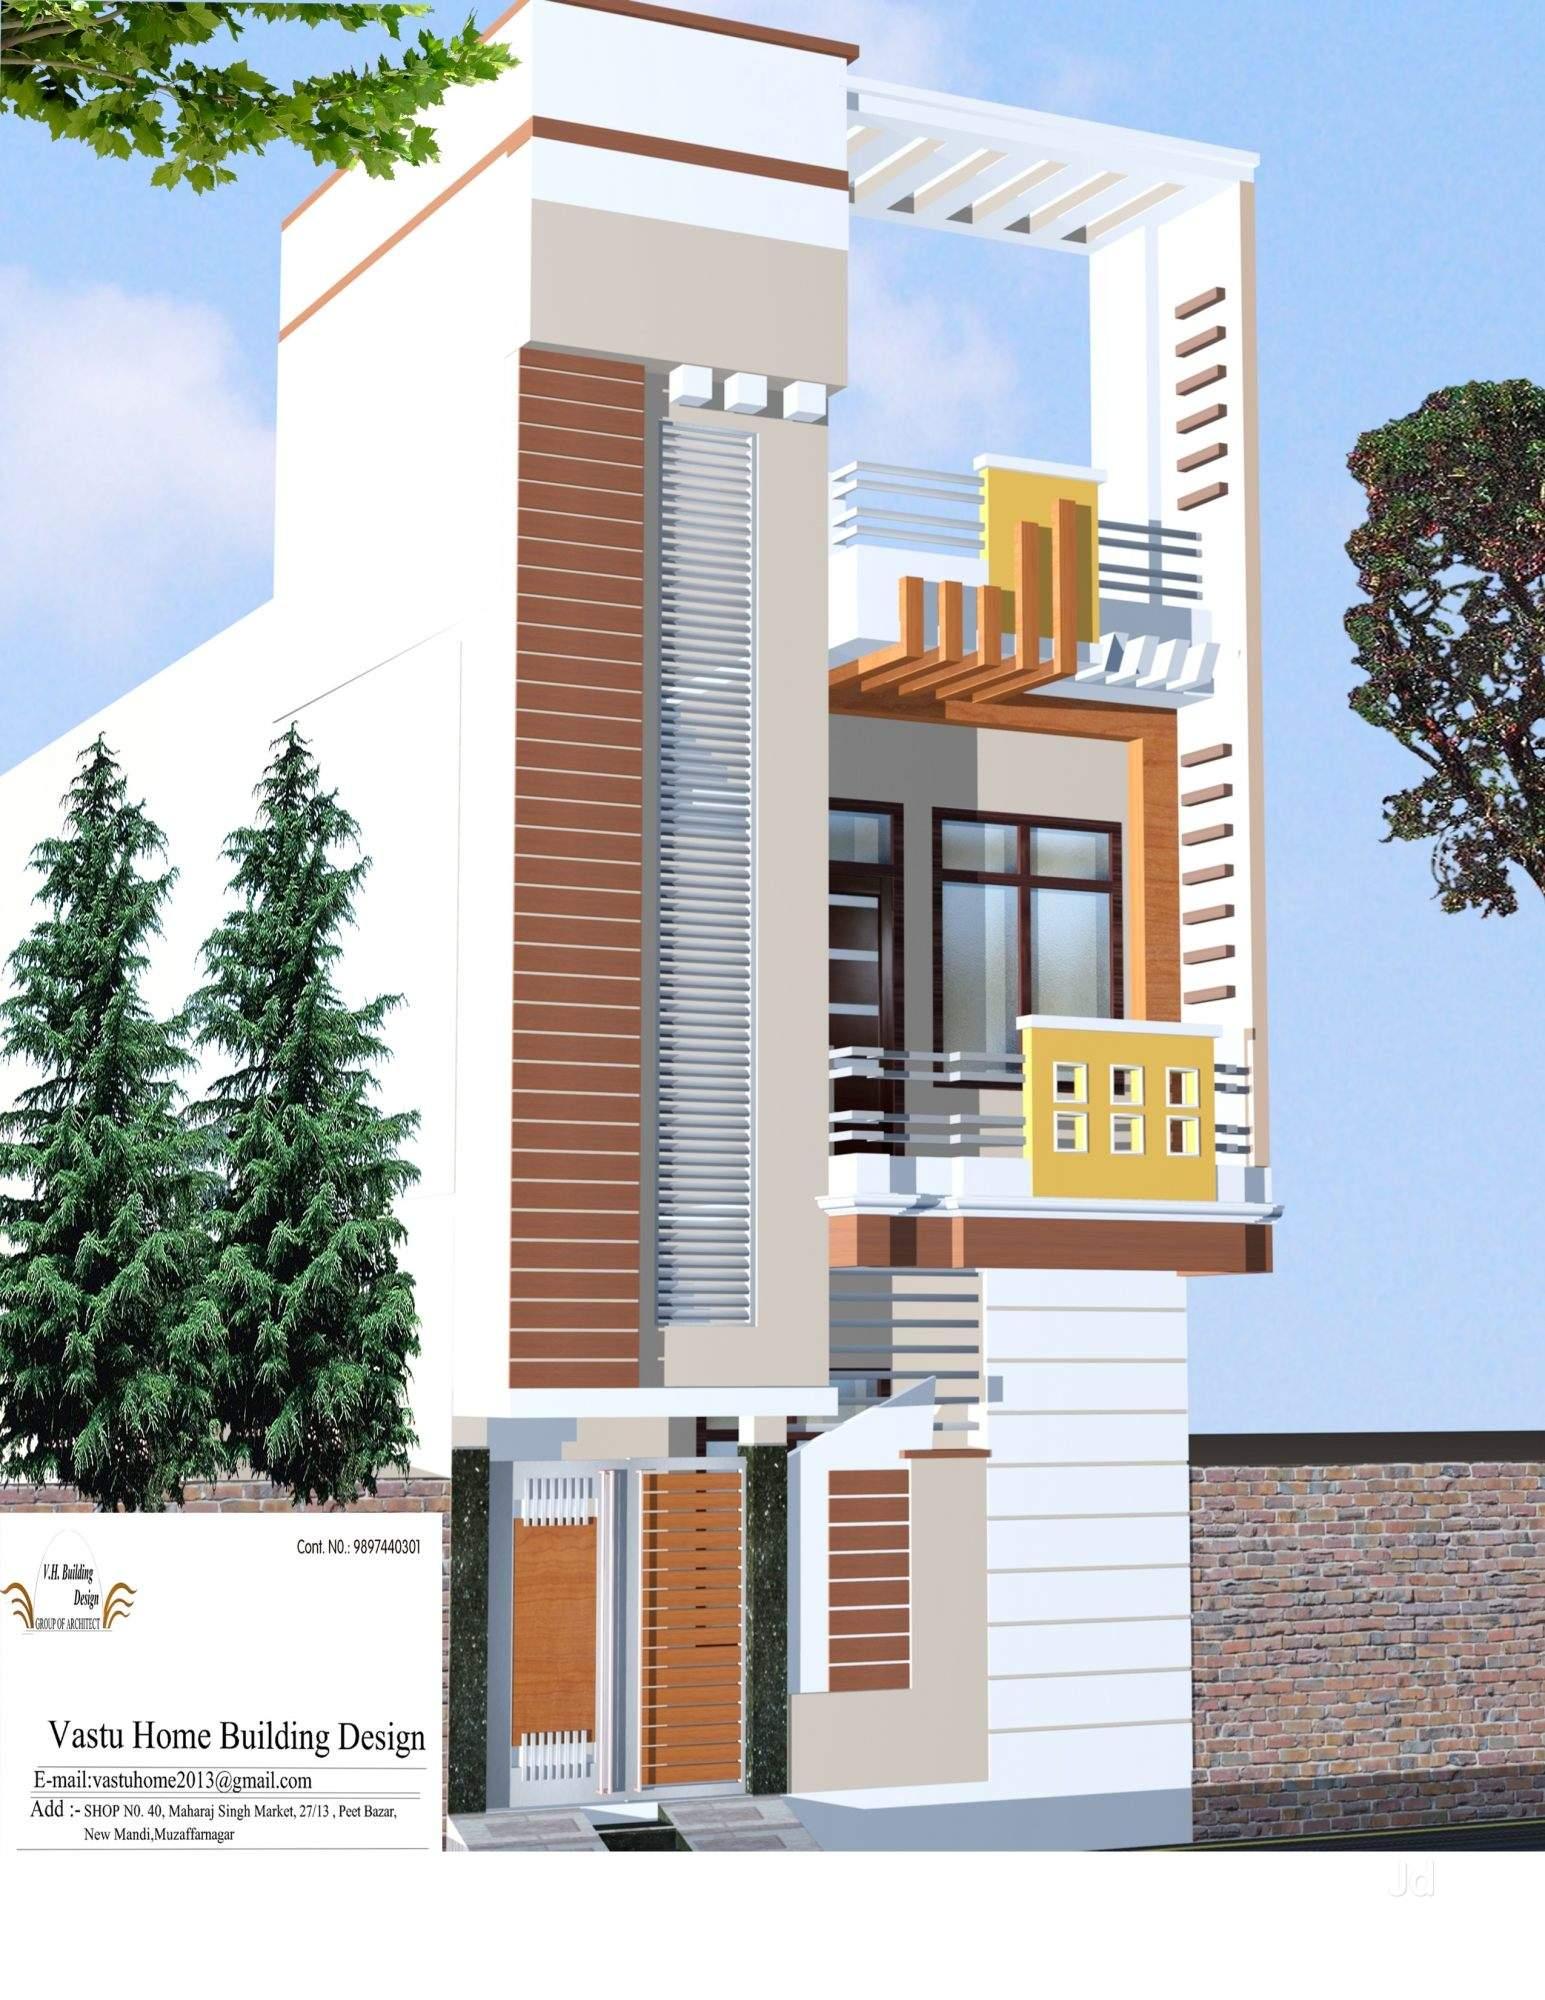 Vastu Home Building Design, Muzaffar Nagar City - Vaastu Home Building  Design - Architects in Muzaffarnagar - Justdial